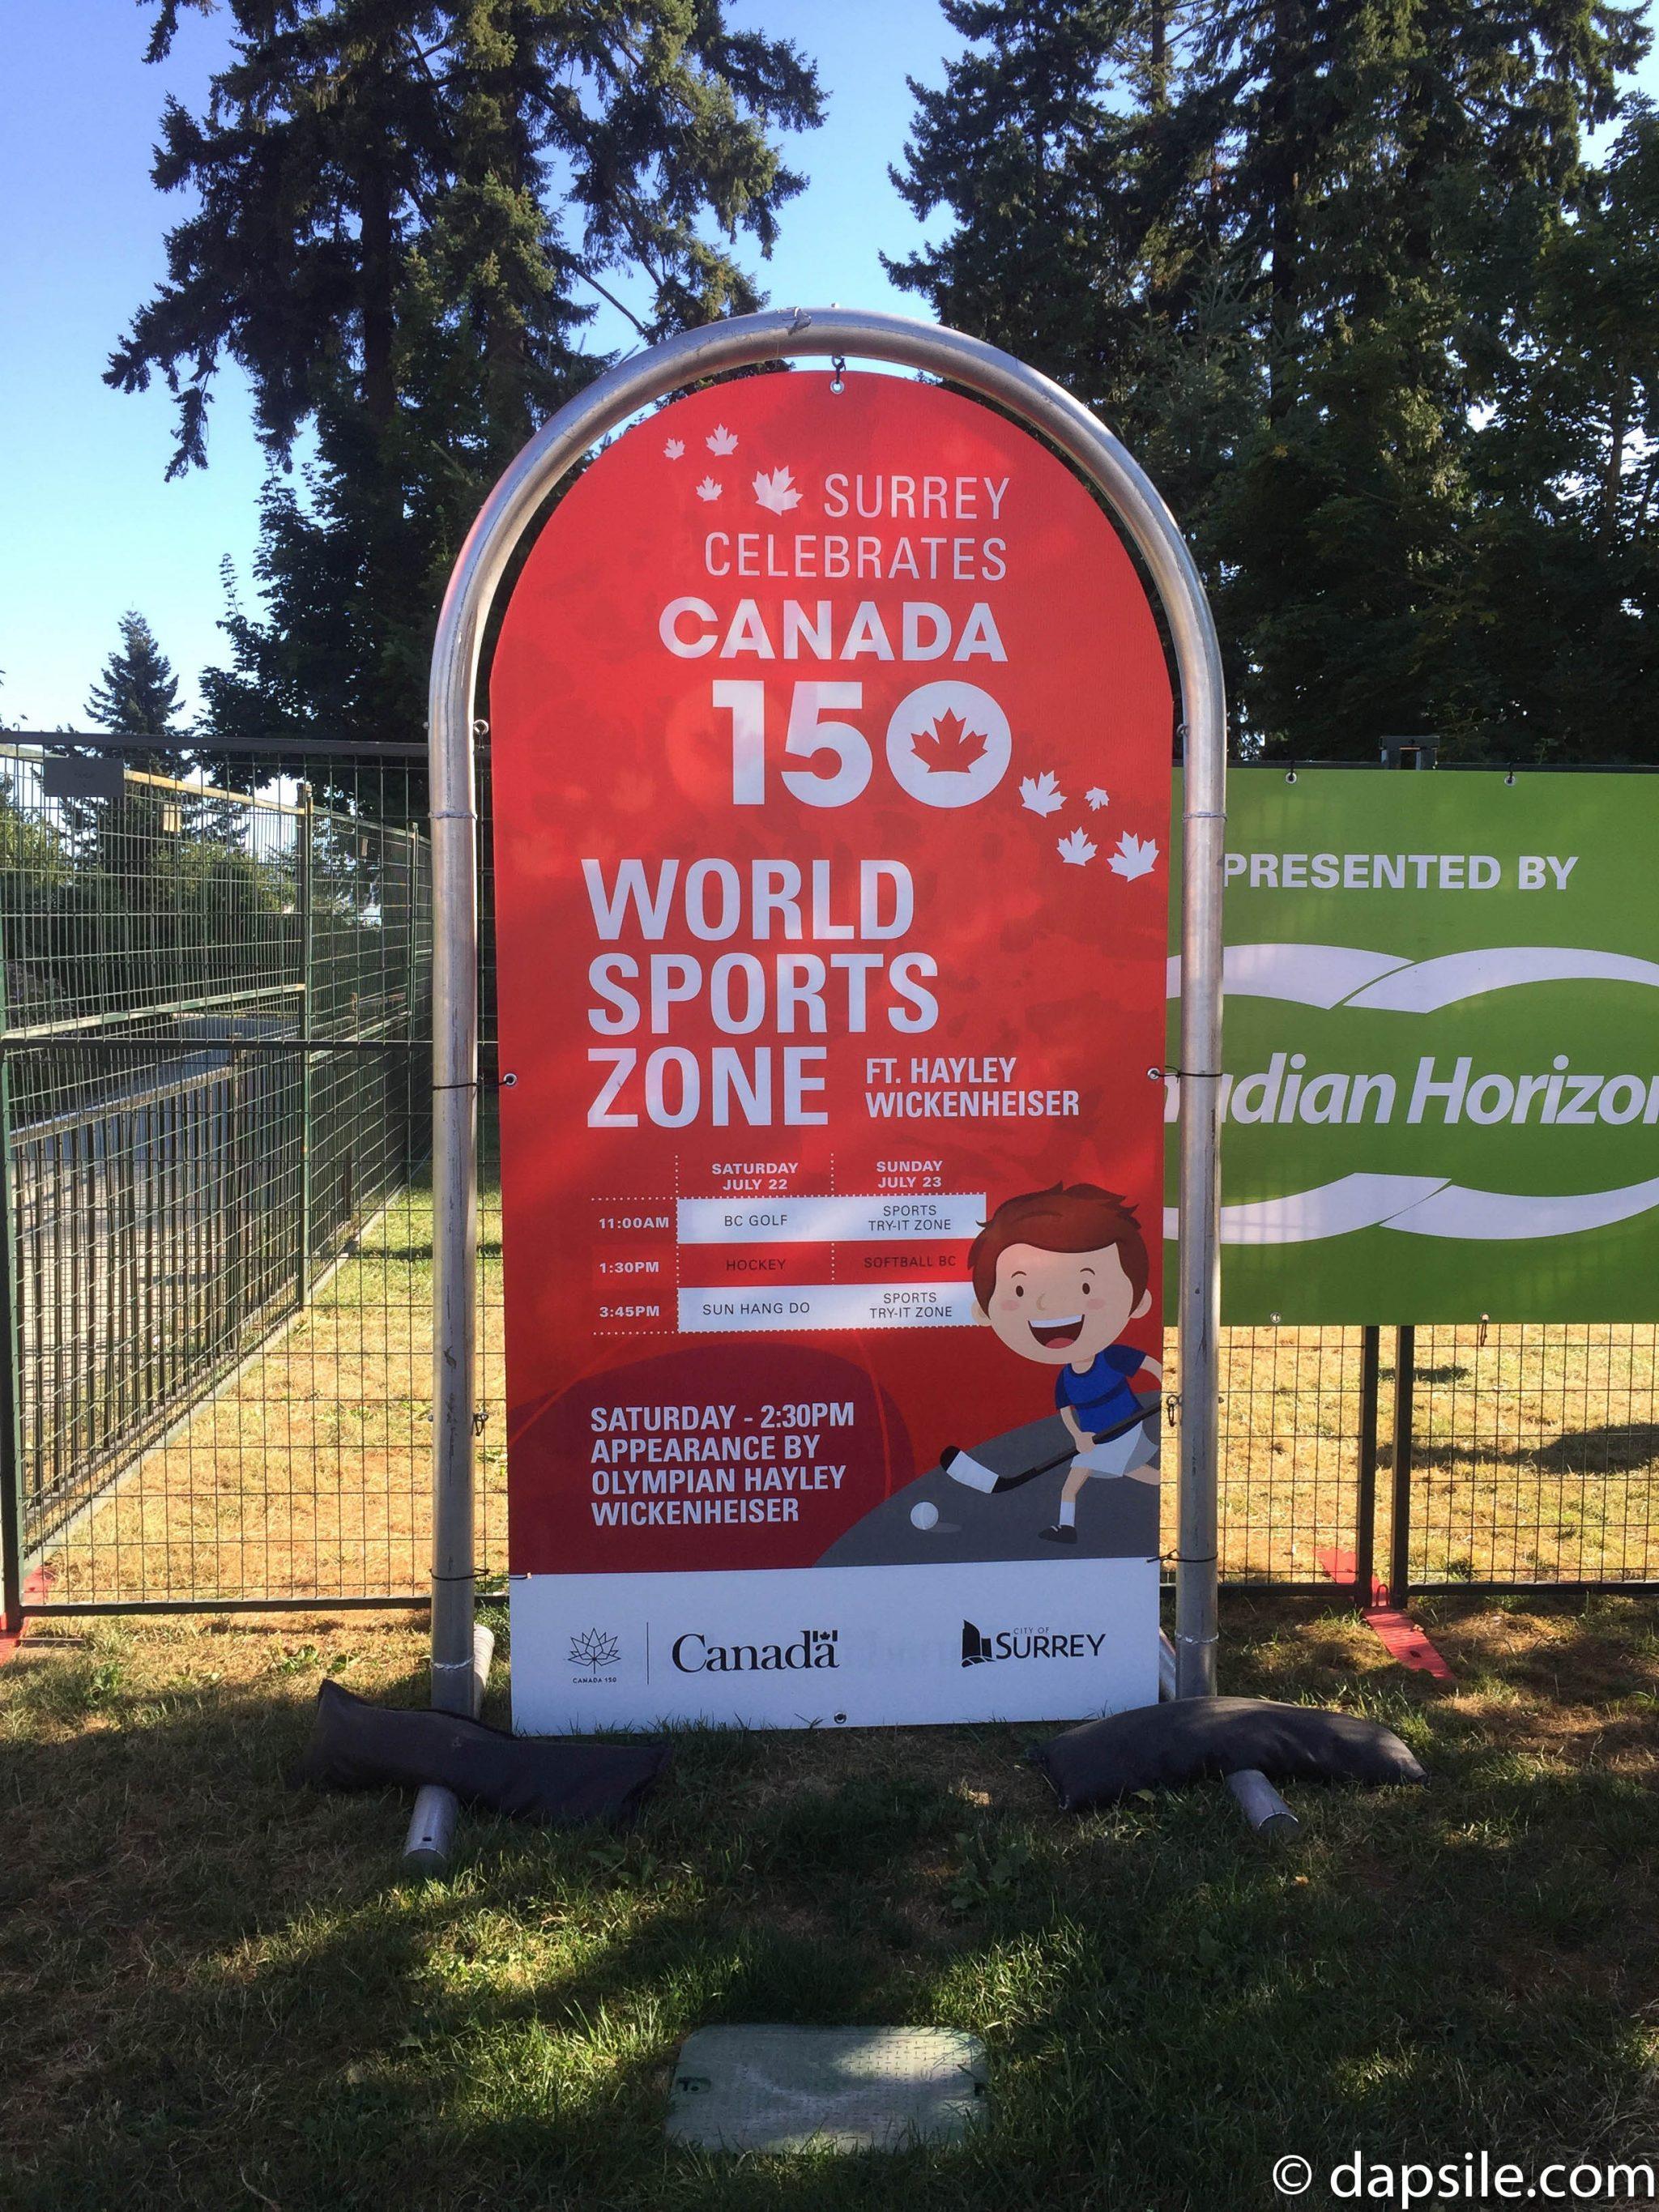 Surrey Fusion Festival 2017 World Sports Zone Schedule